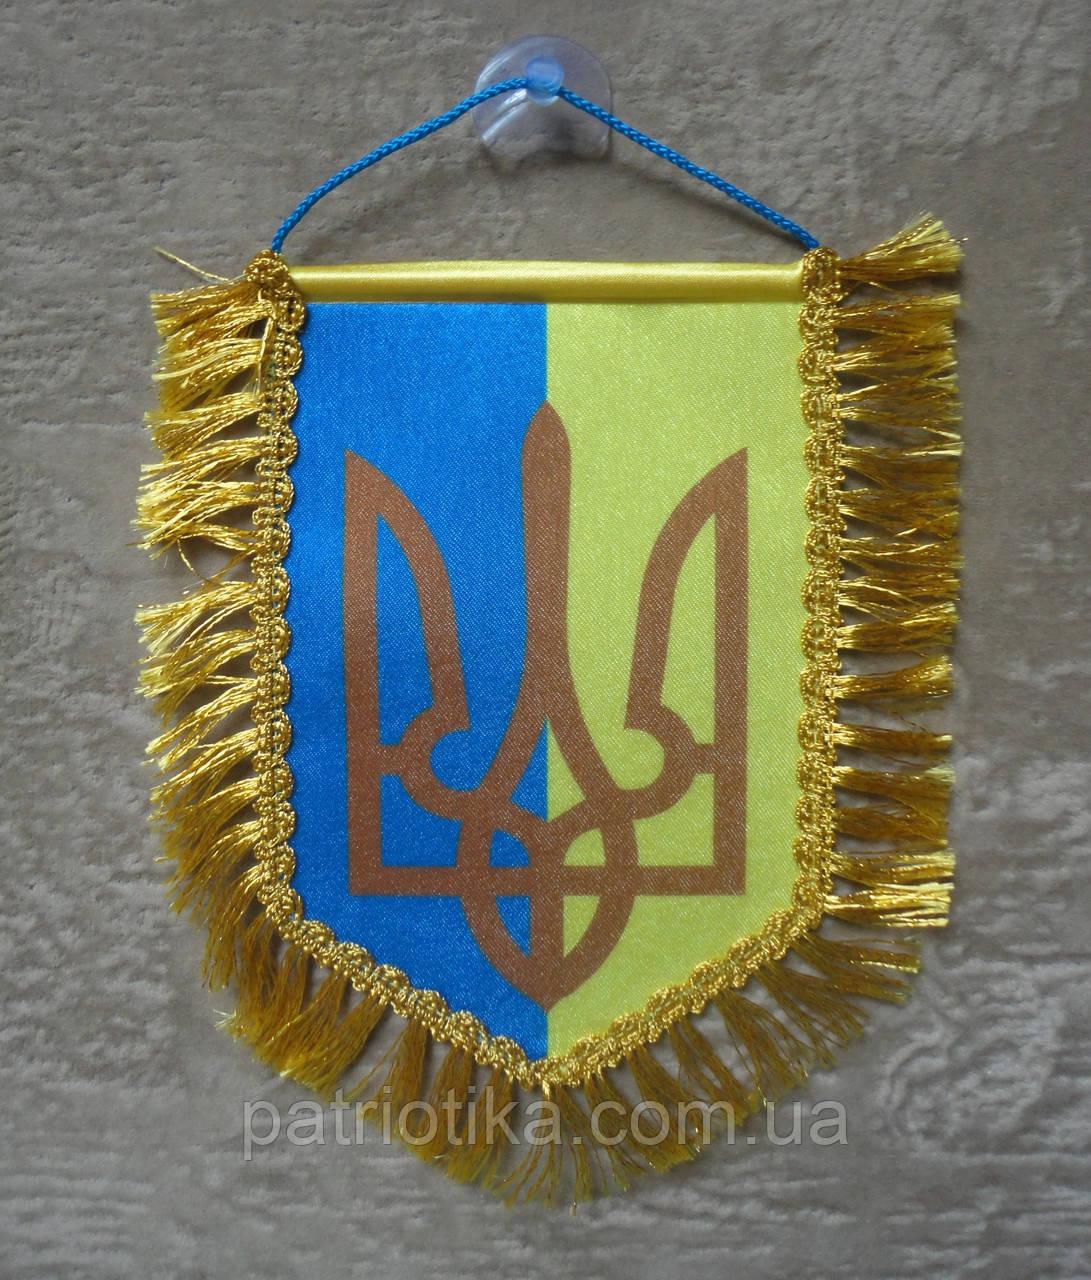 Вымпел Украины двухцветный   Вимпел України двоколірний 16х11 см с бахромой з бахромою